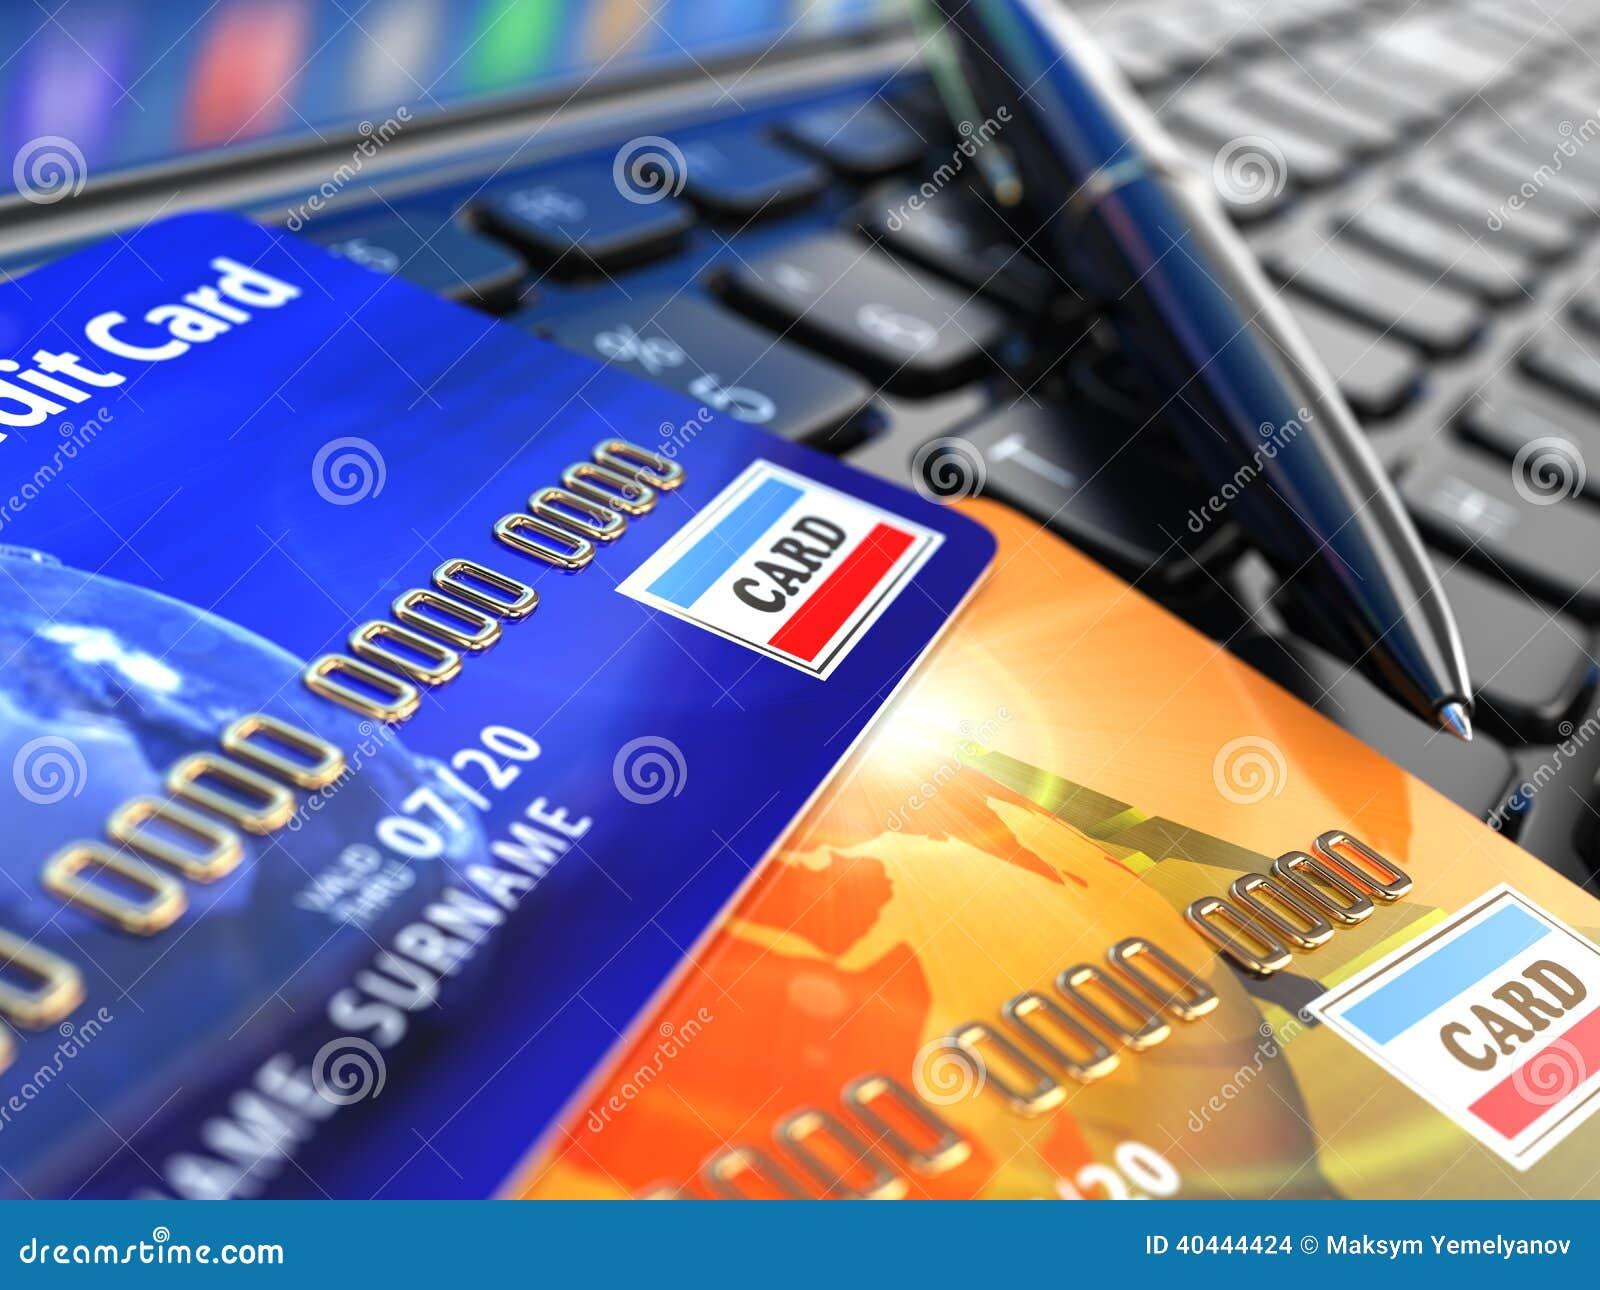 Online shopping visa card